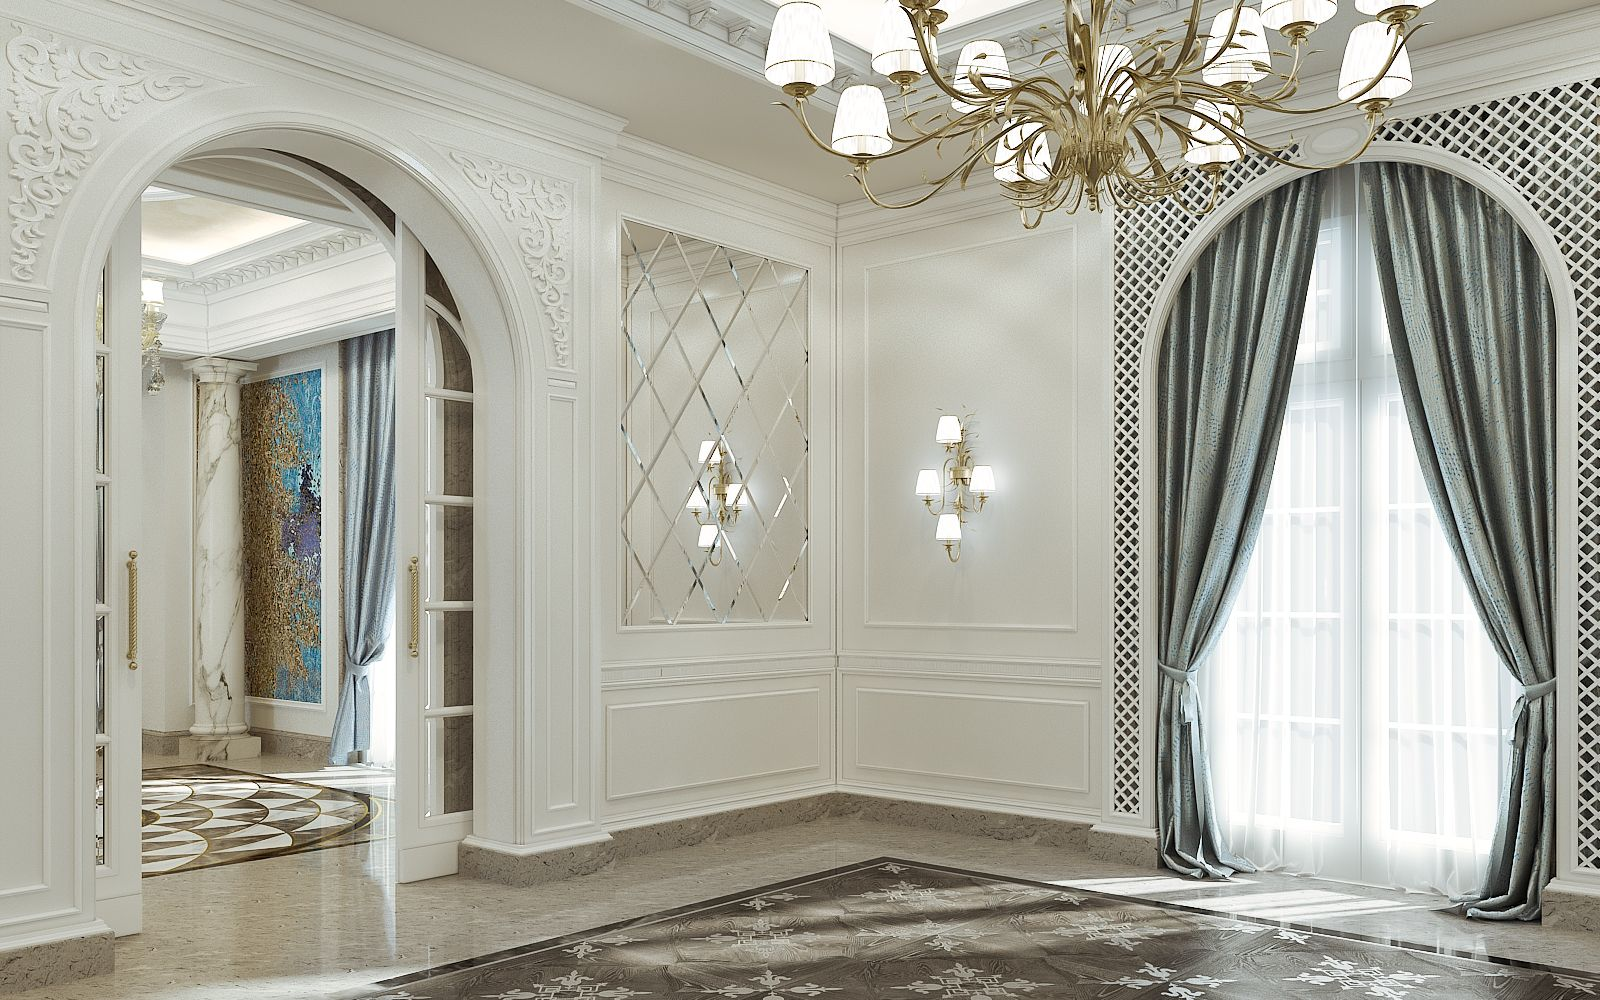 Family House - Saudi Arabia 765